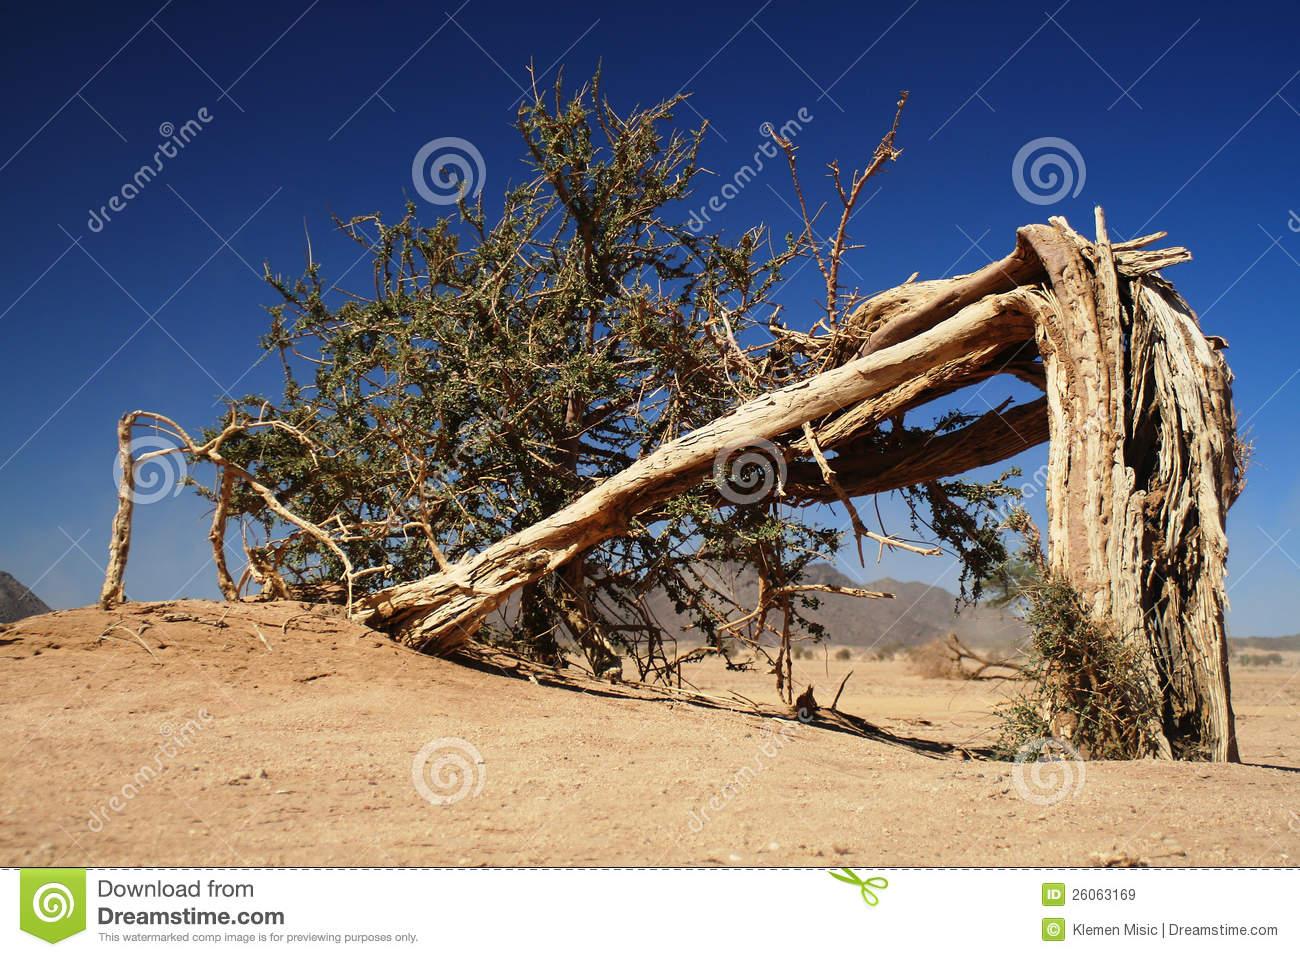 Lonely Broken Tree In Sahara Desert.